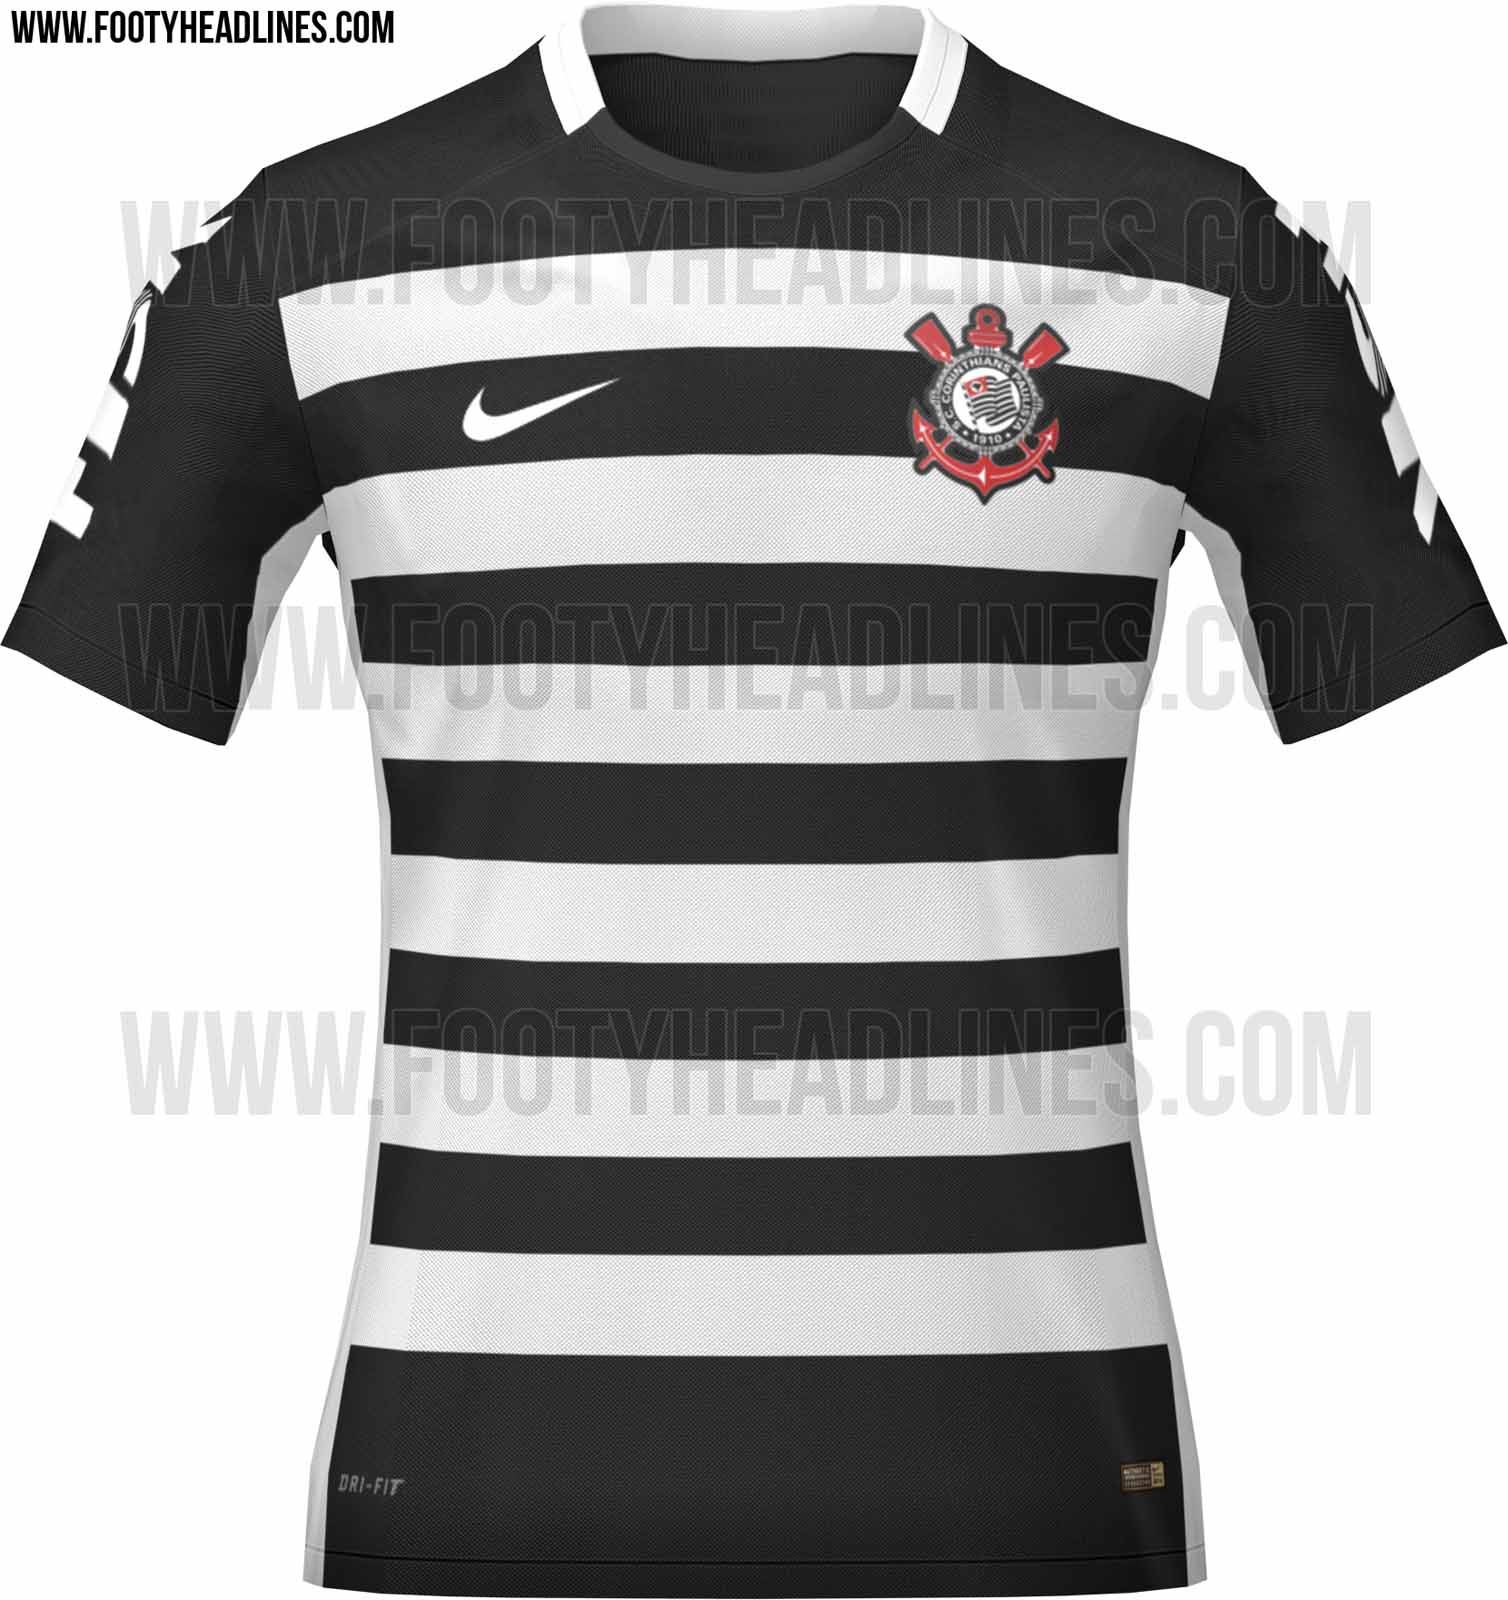 018b61c506b81 Camisas Corinthians Nike 2015